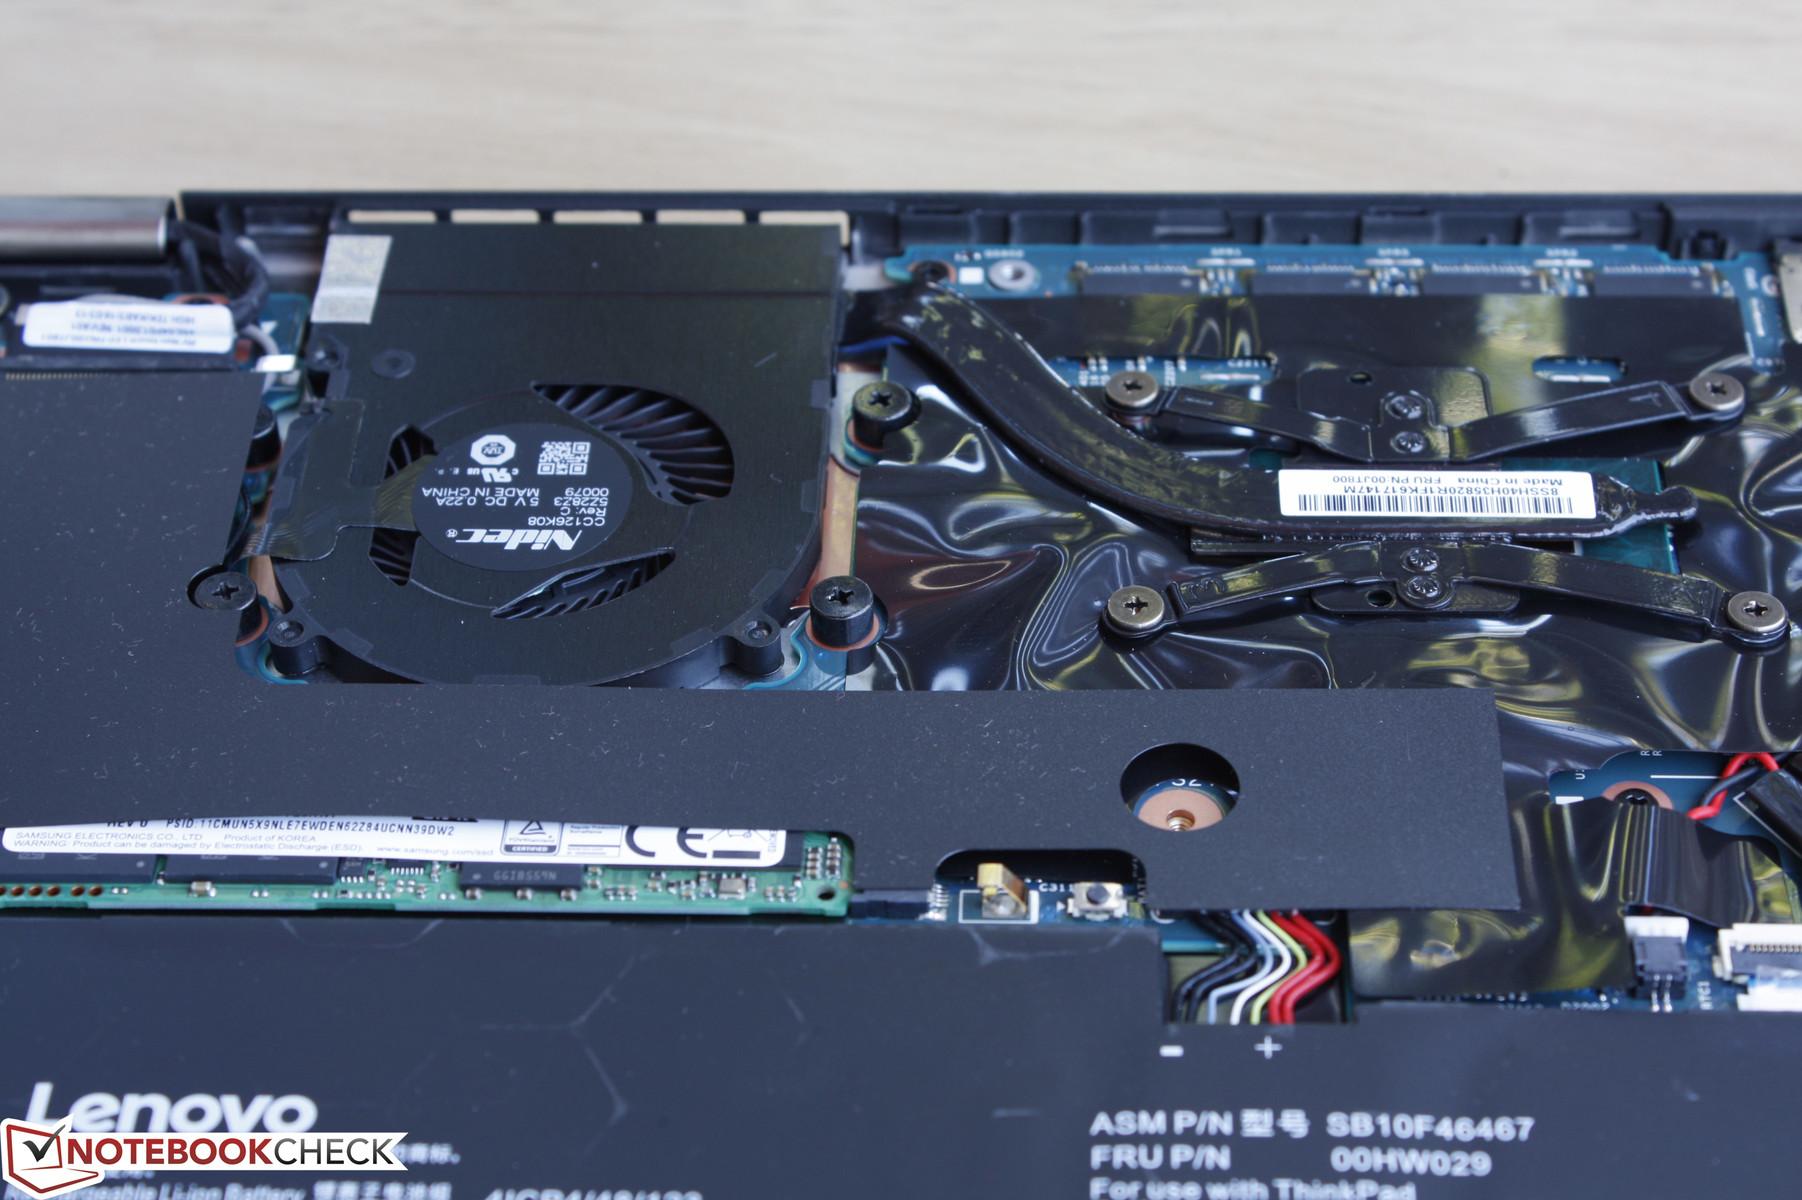 Lenovo thinkpad x1 carbon fan noise